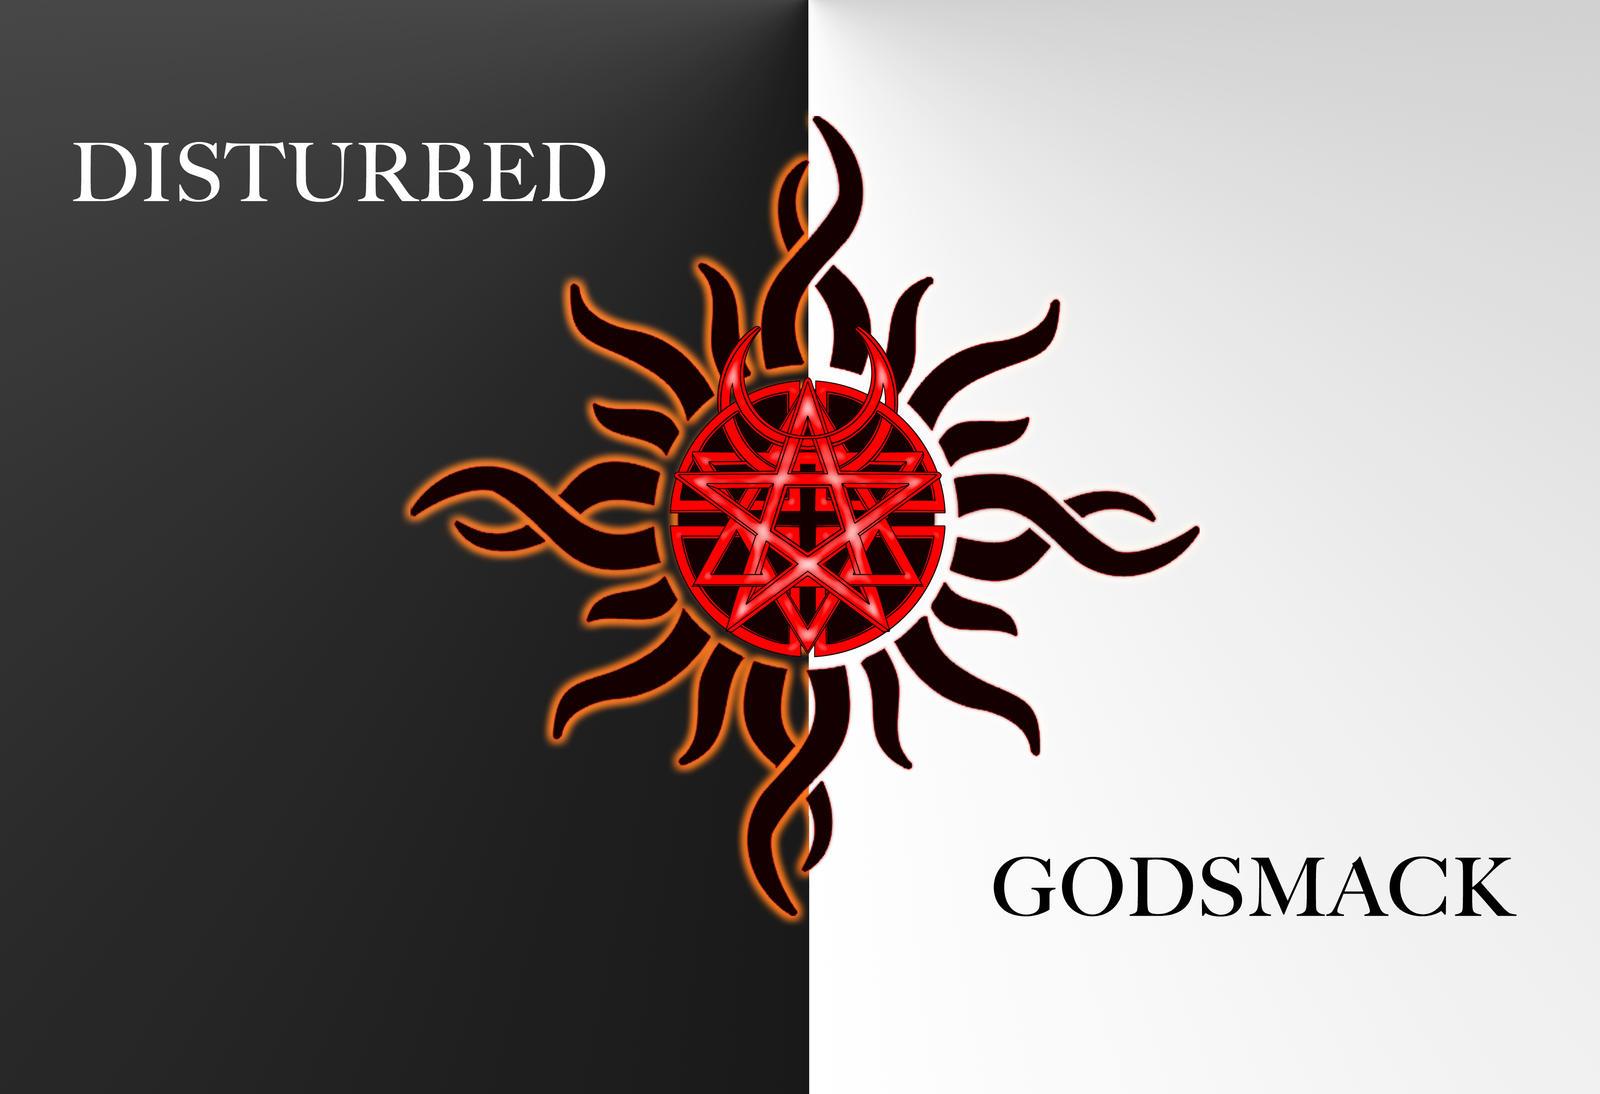 disturbed godsmack wallpaper by southerndisturbedone on